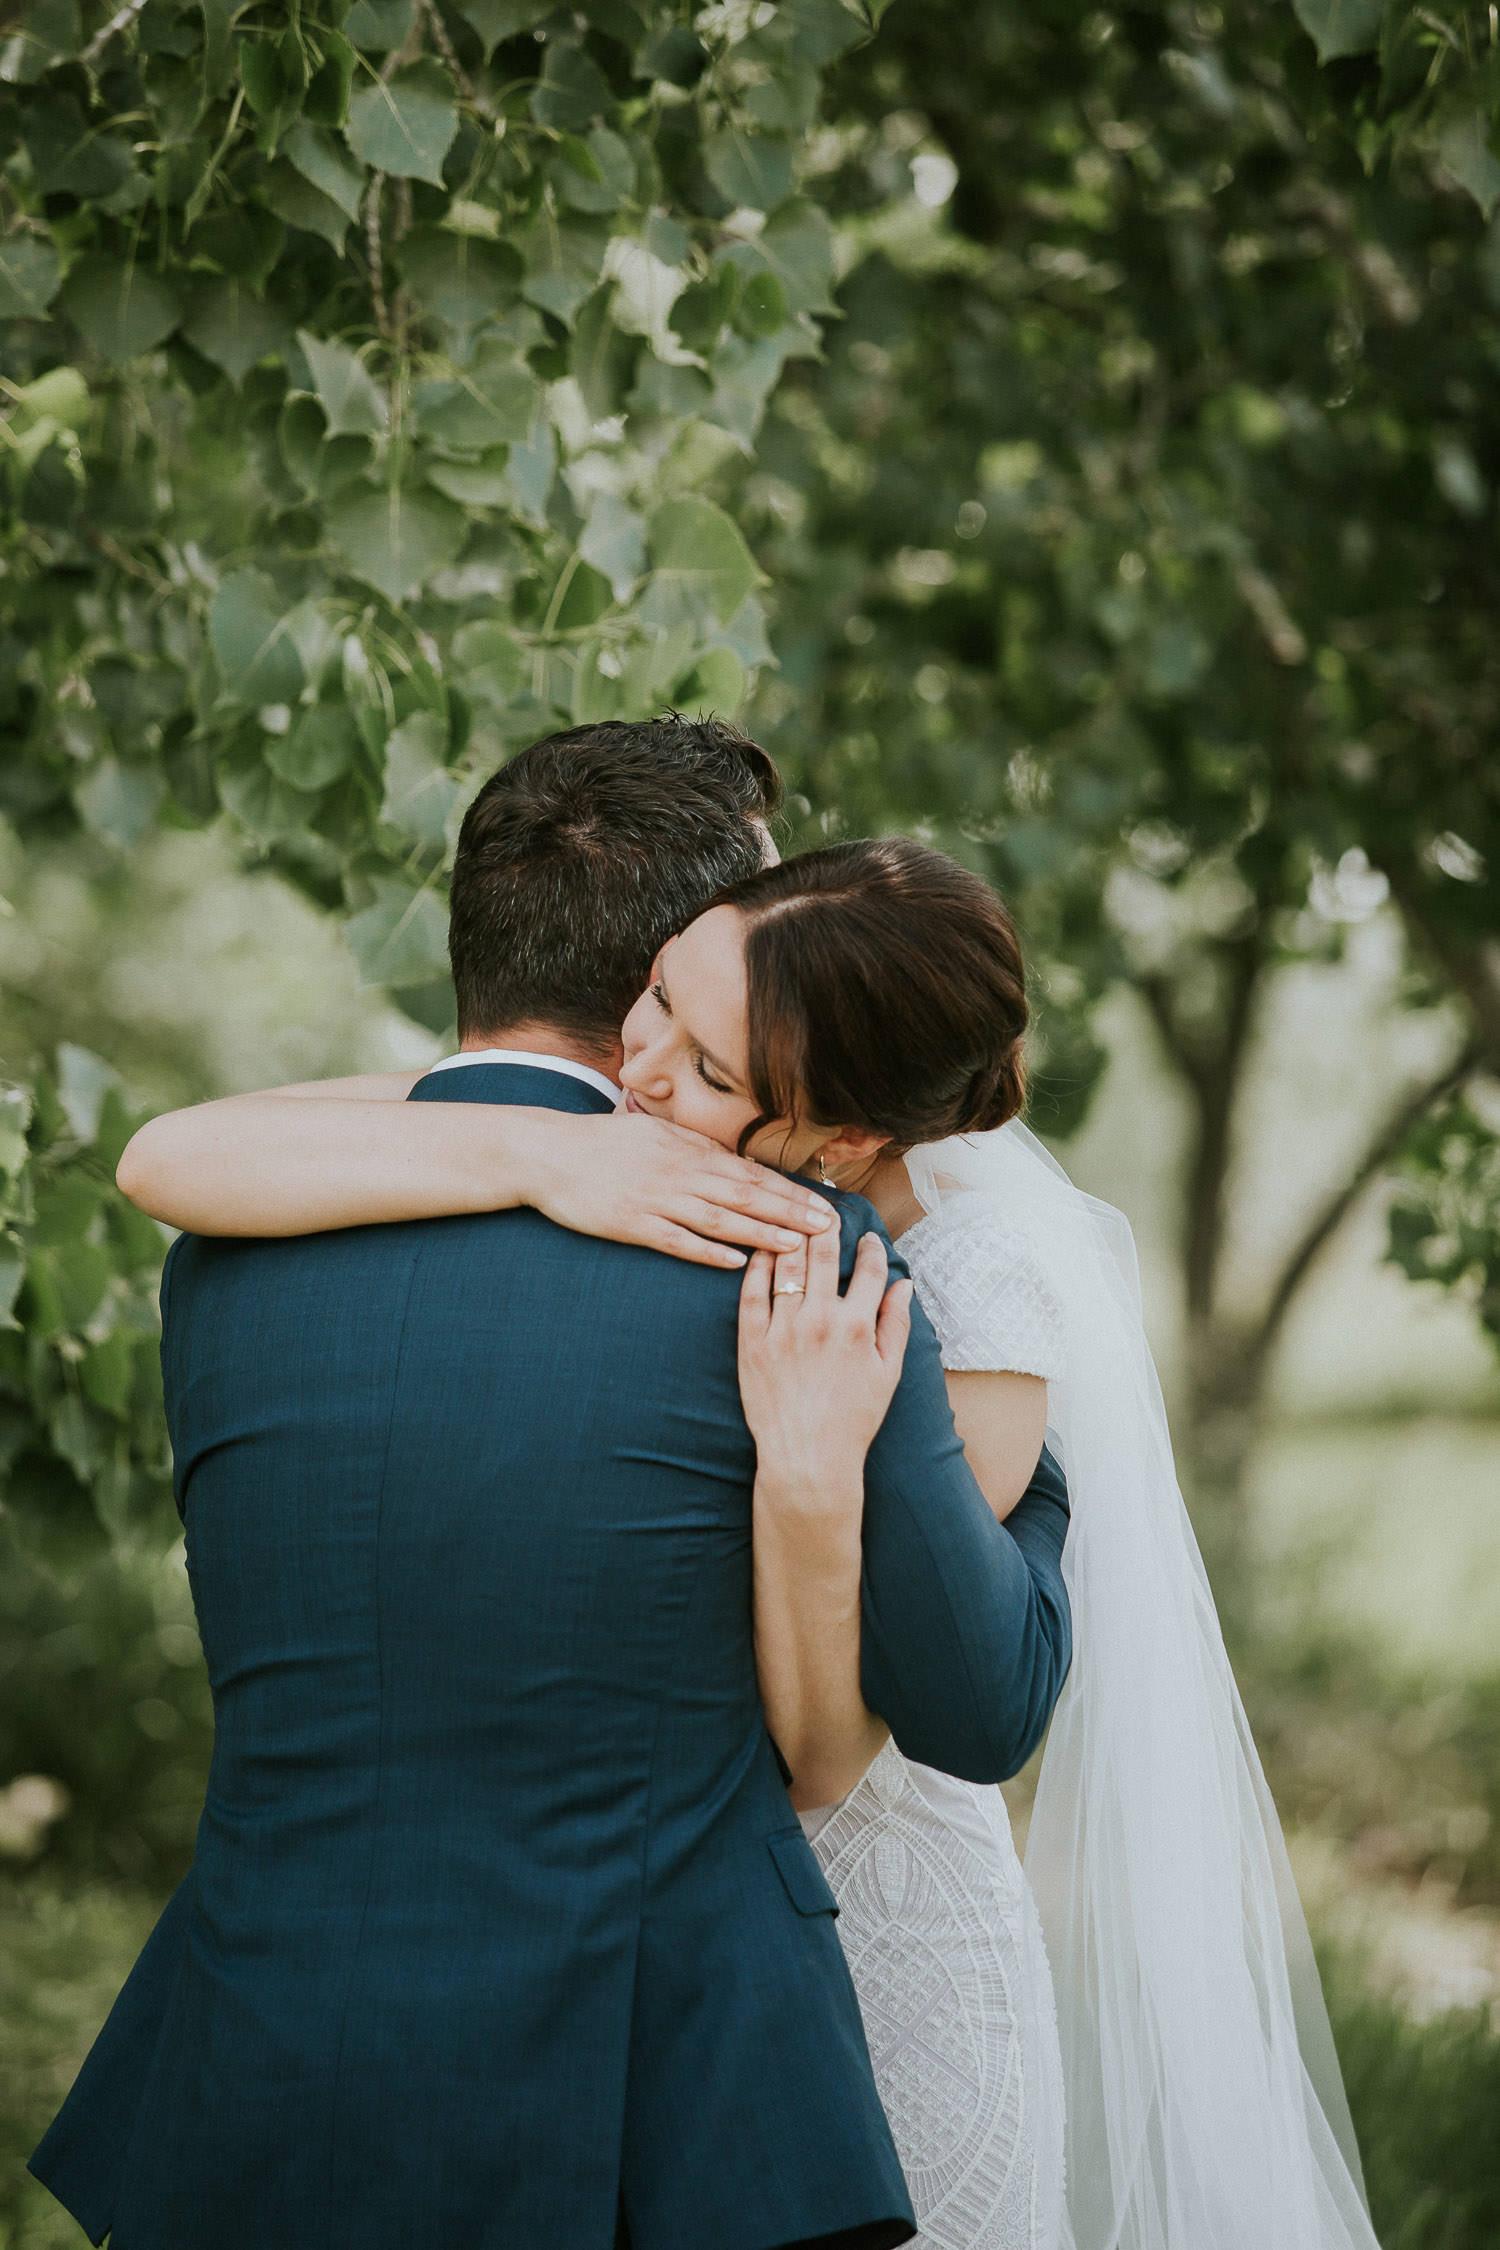 summer-backyard-wedding-in-alberta-sarah-pukin-0048